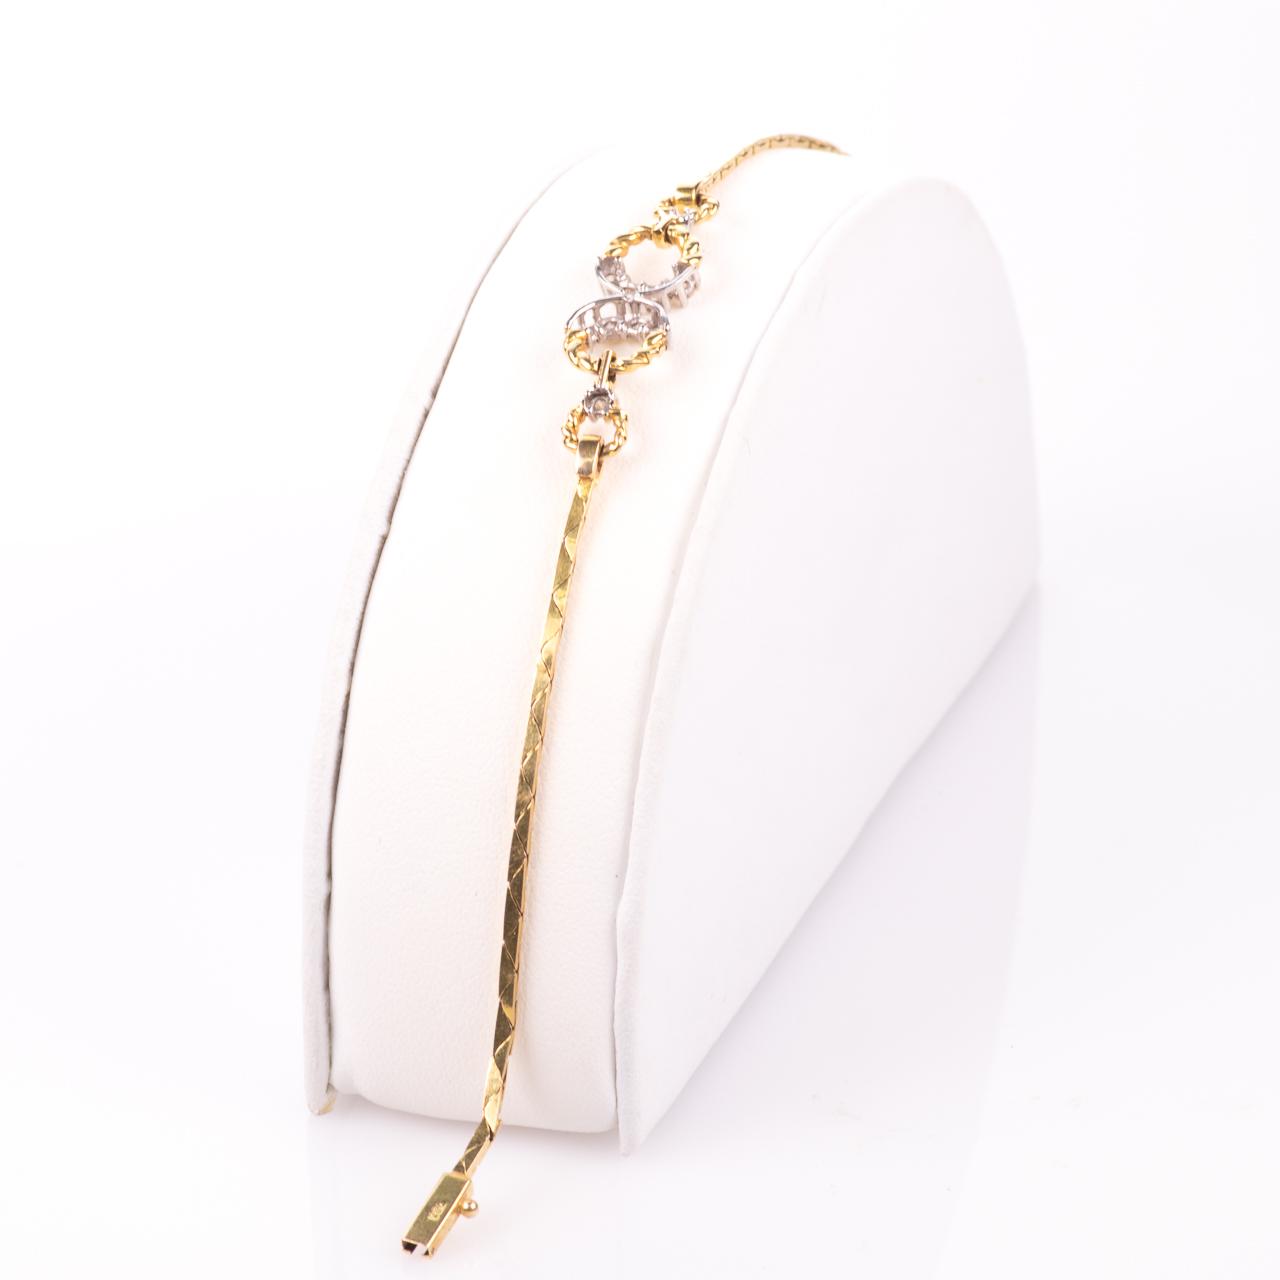 18ct Gold 0.30ct Diamond Bracelet - Image 6 of 6